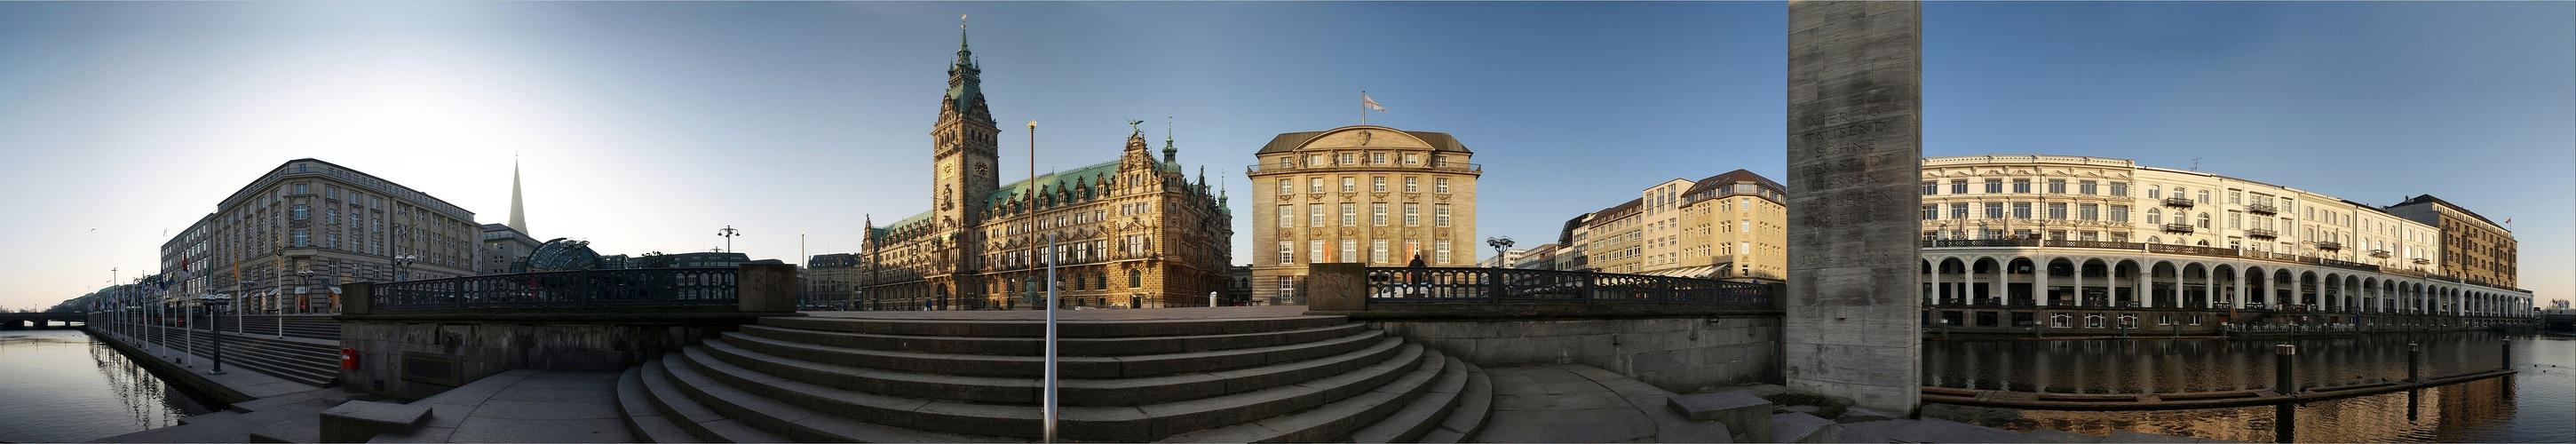 Hamburg Rathausmarkt - Reload